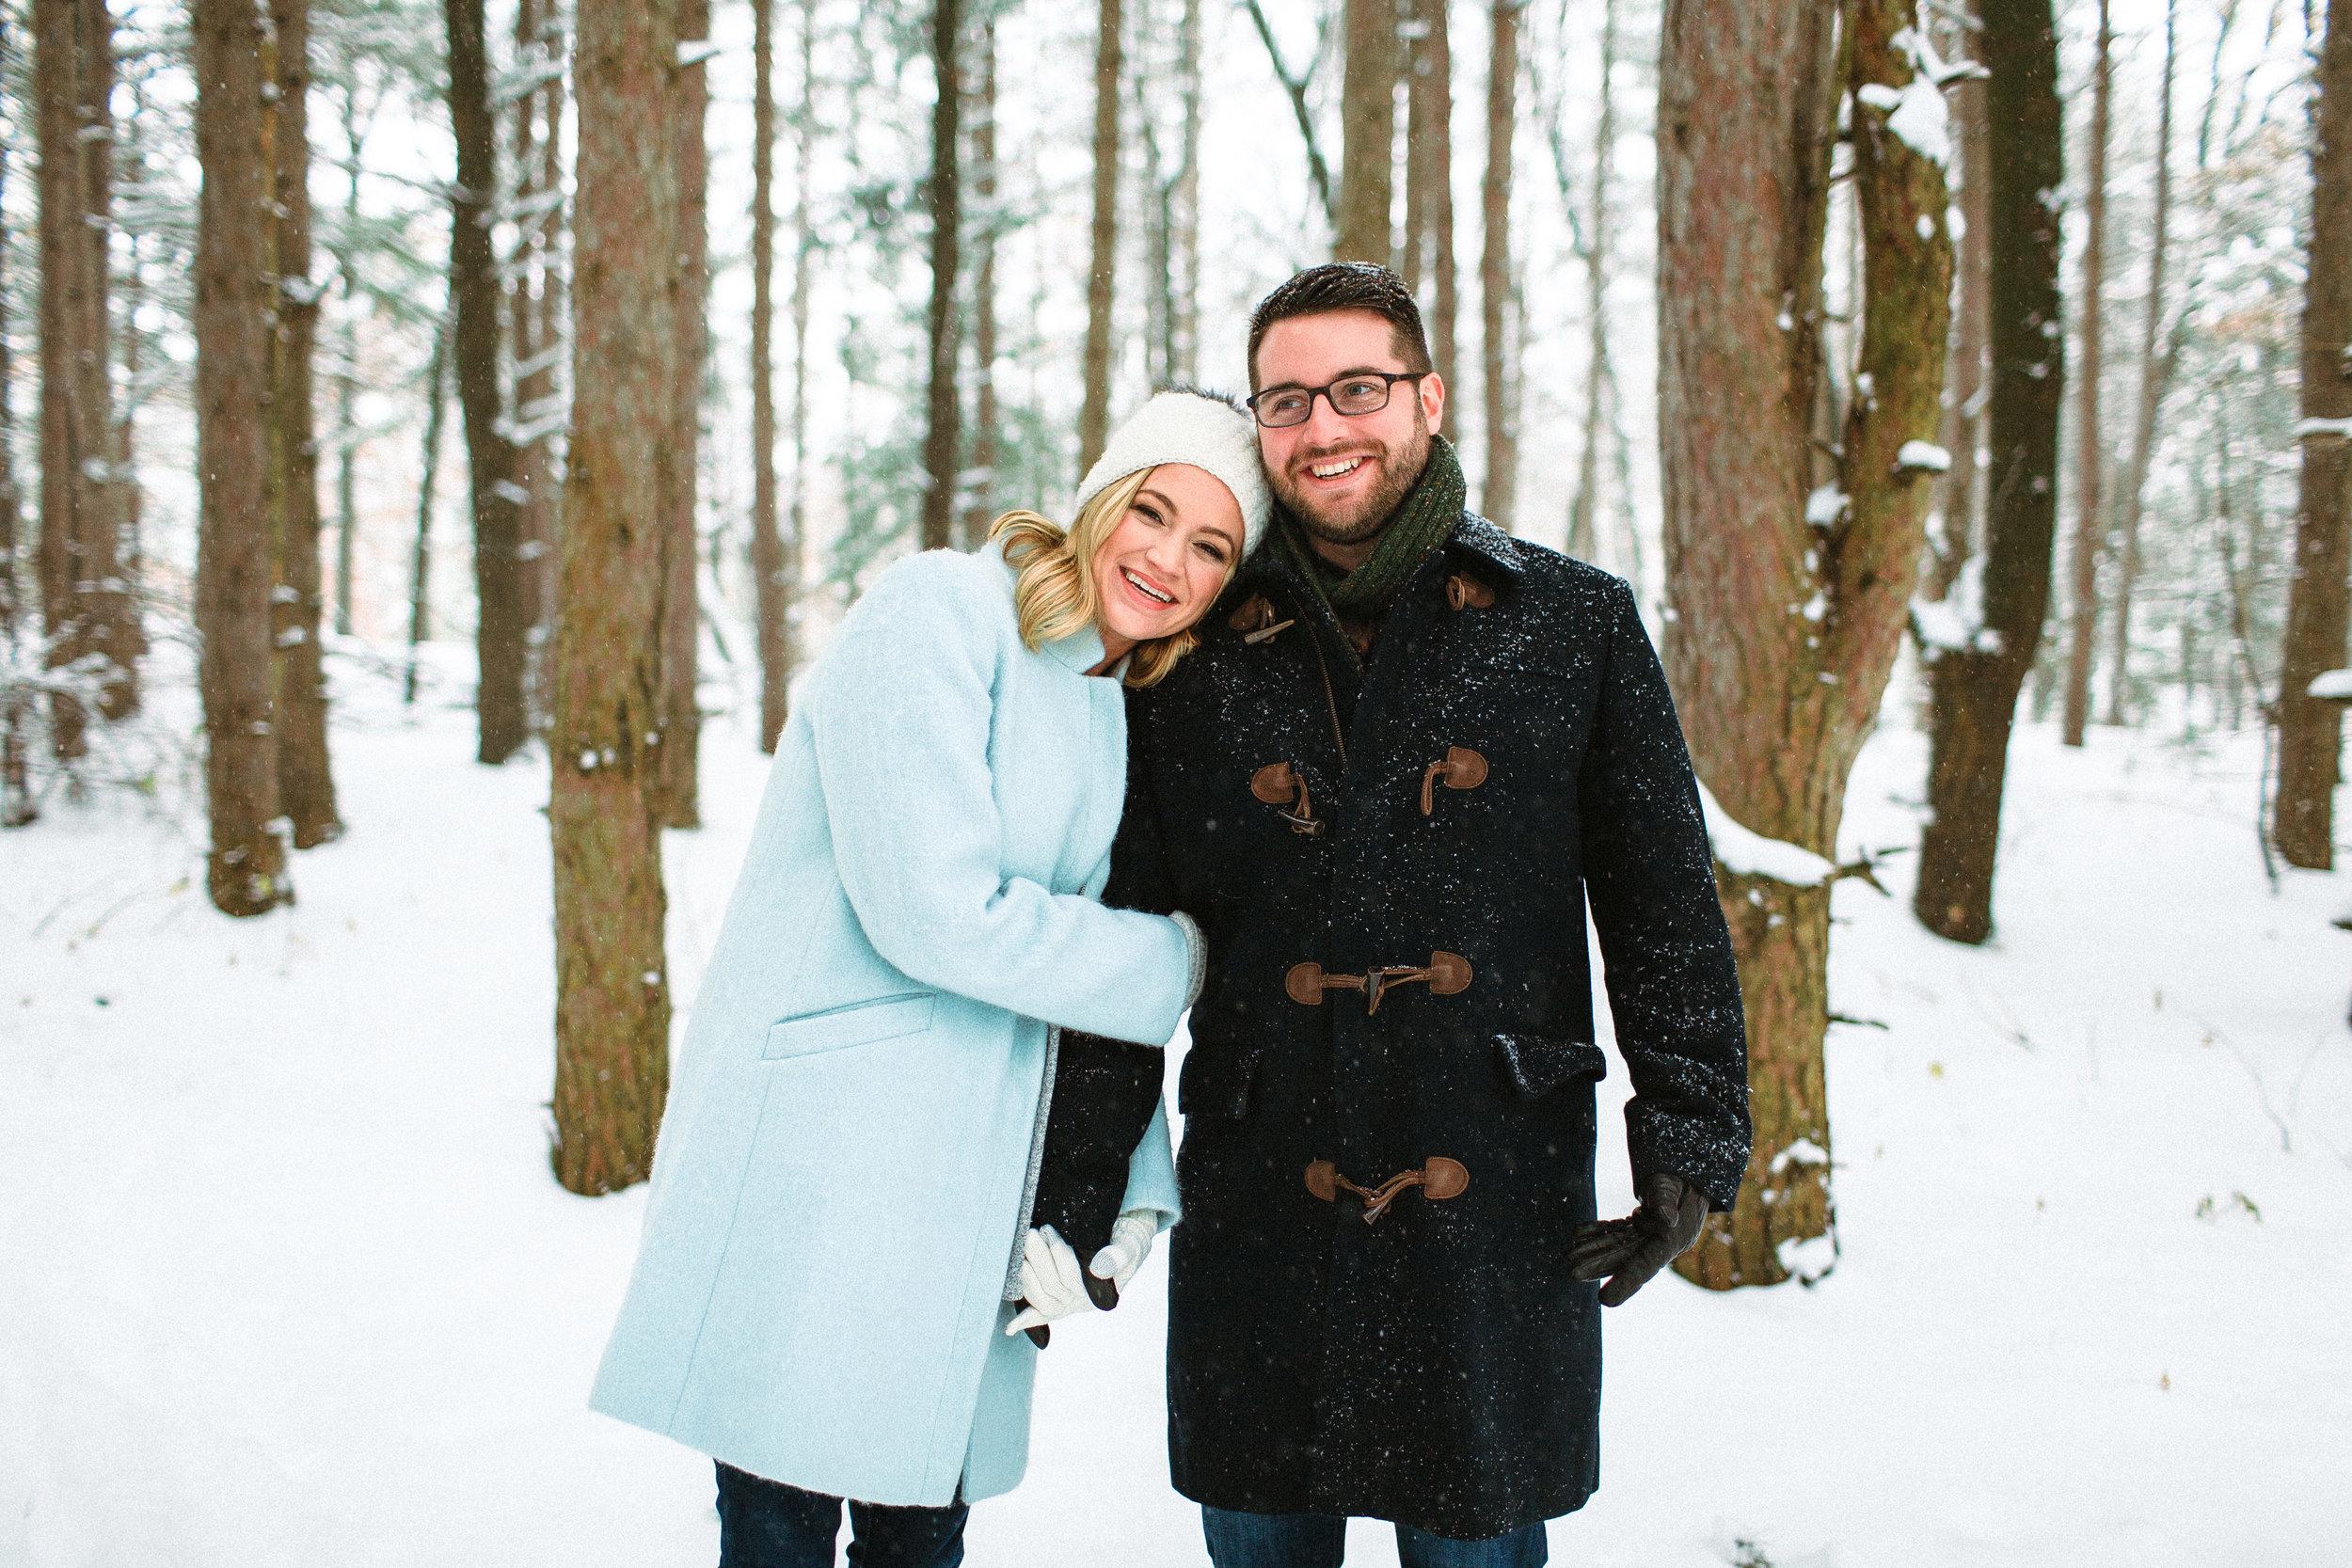 Grand Rapids Michigan Midwest Wedding Photographer Winter Wonderland Engagement Photos